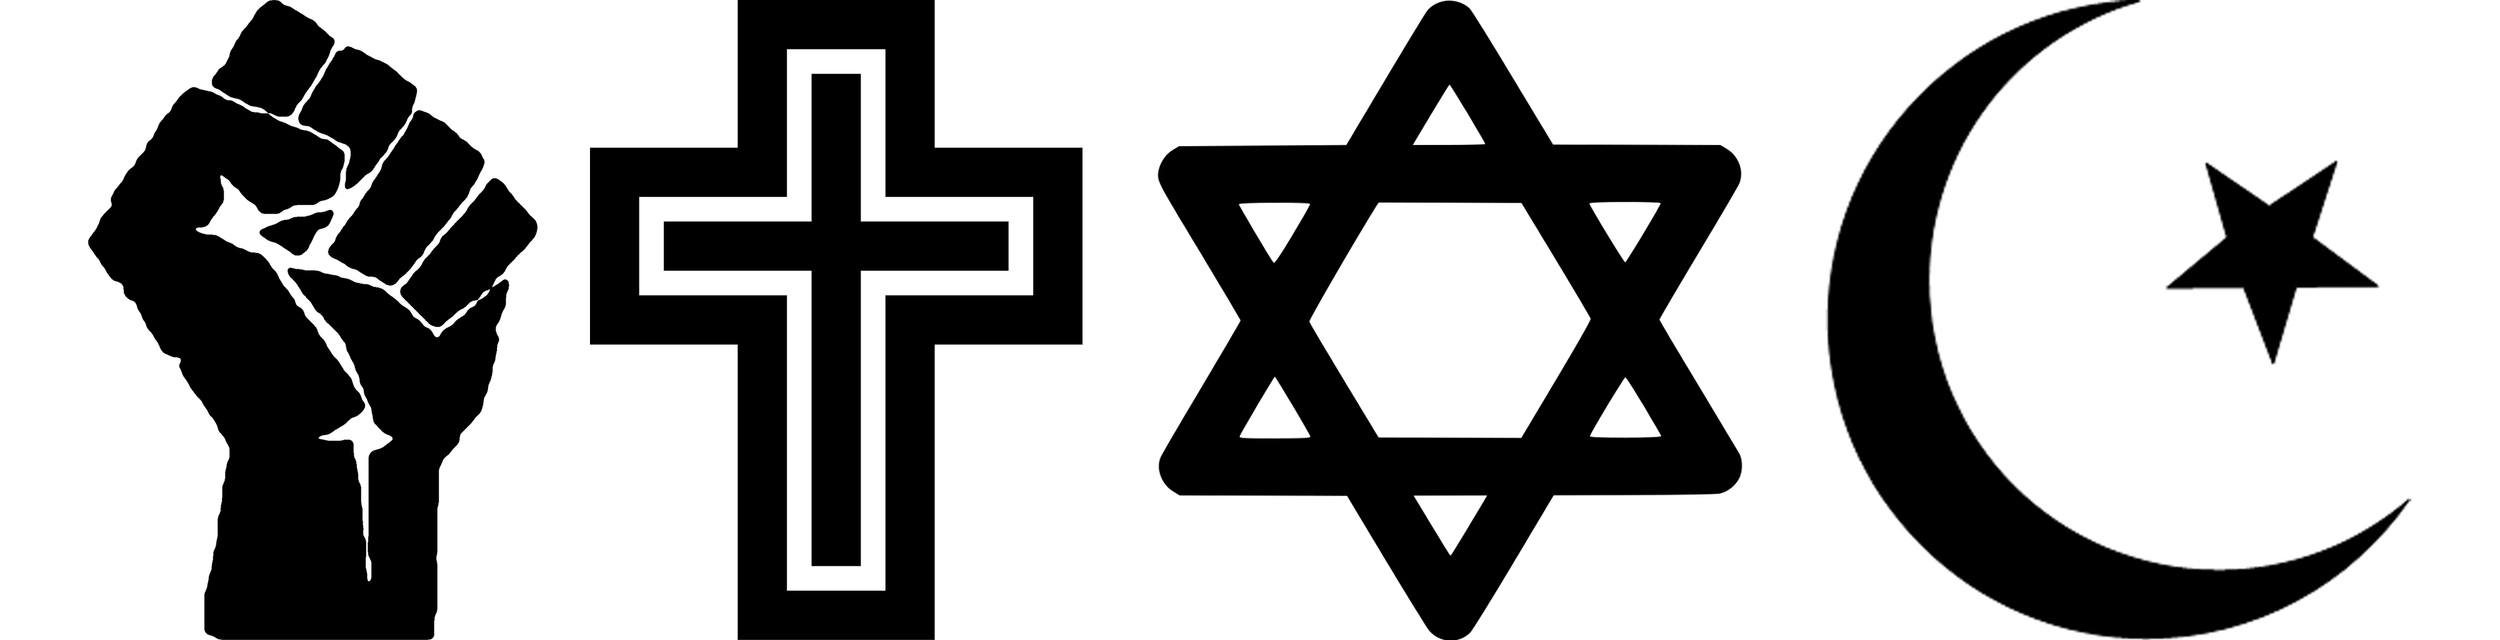 religious-symbols.png